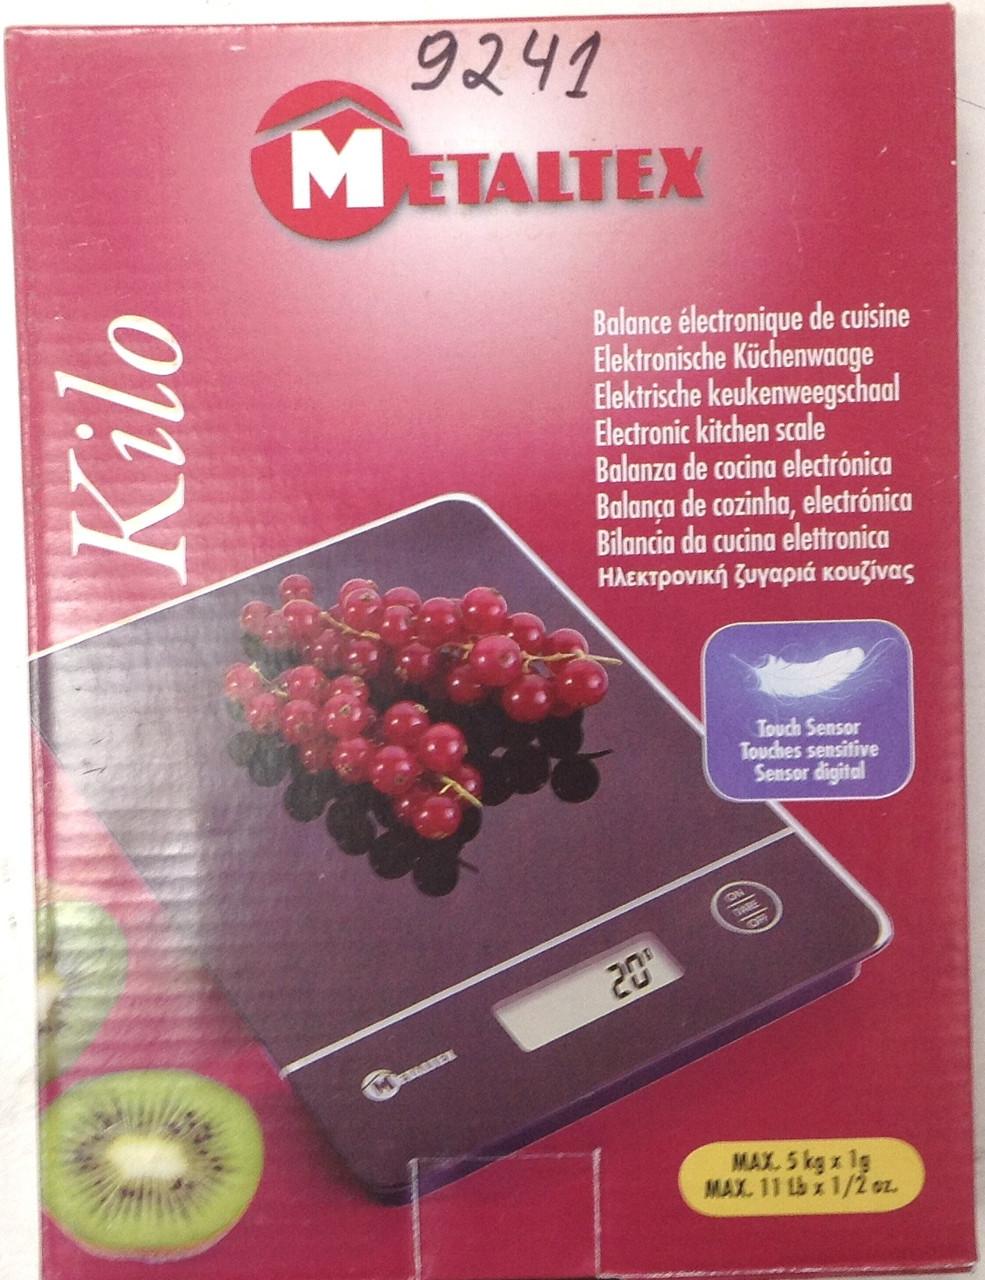 Весы Metaltex-9241